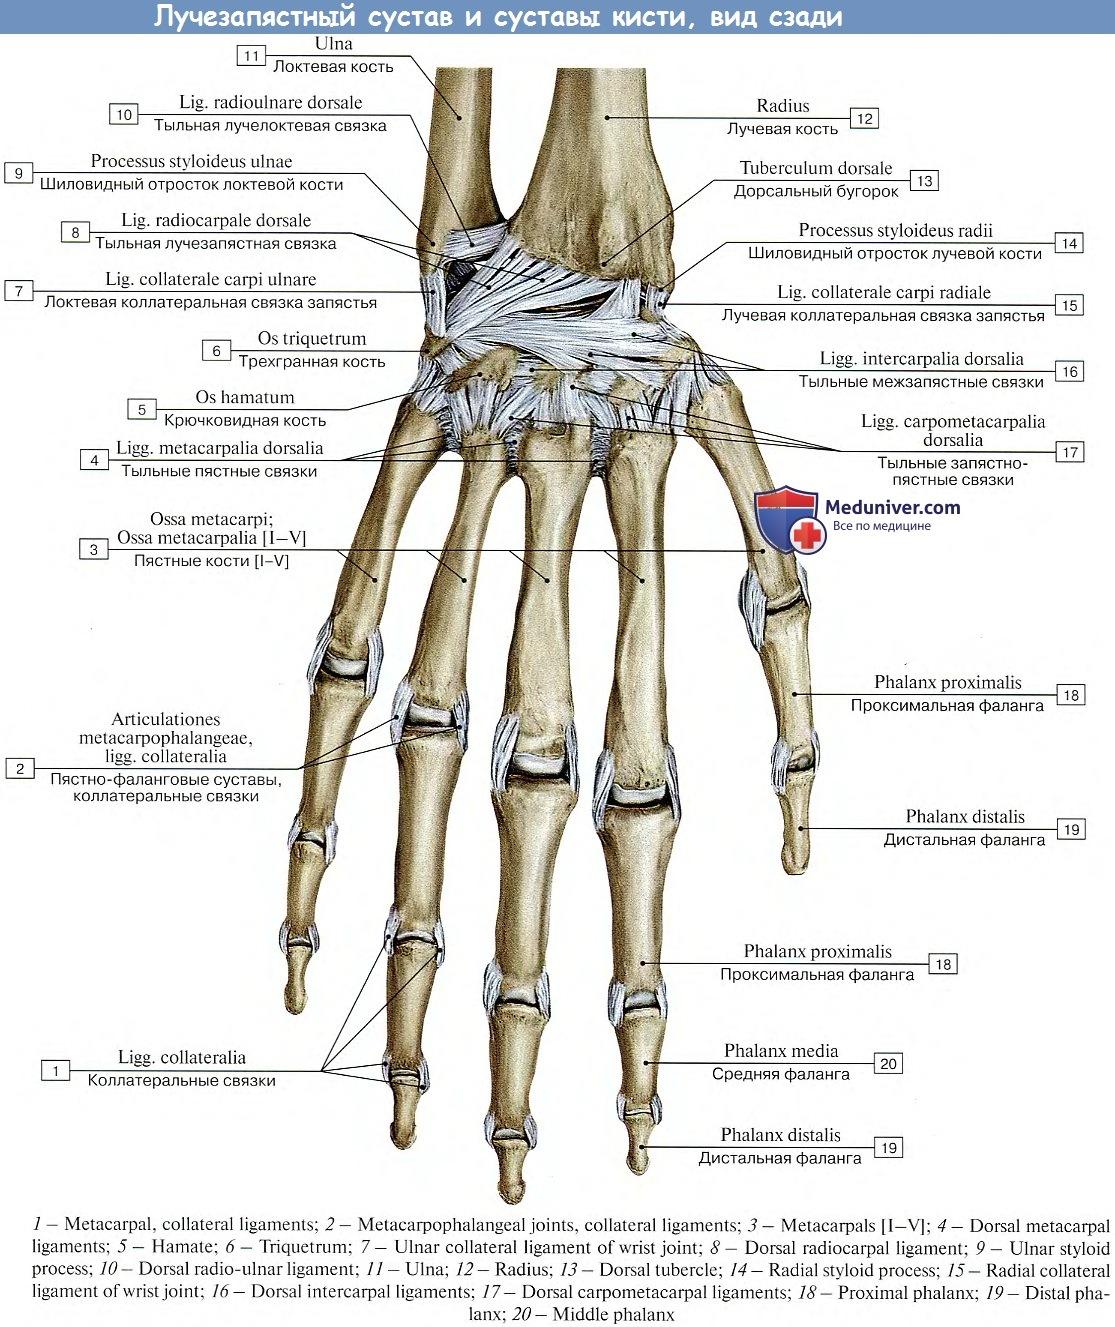 артроскопия коленного сустава в туле цена